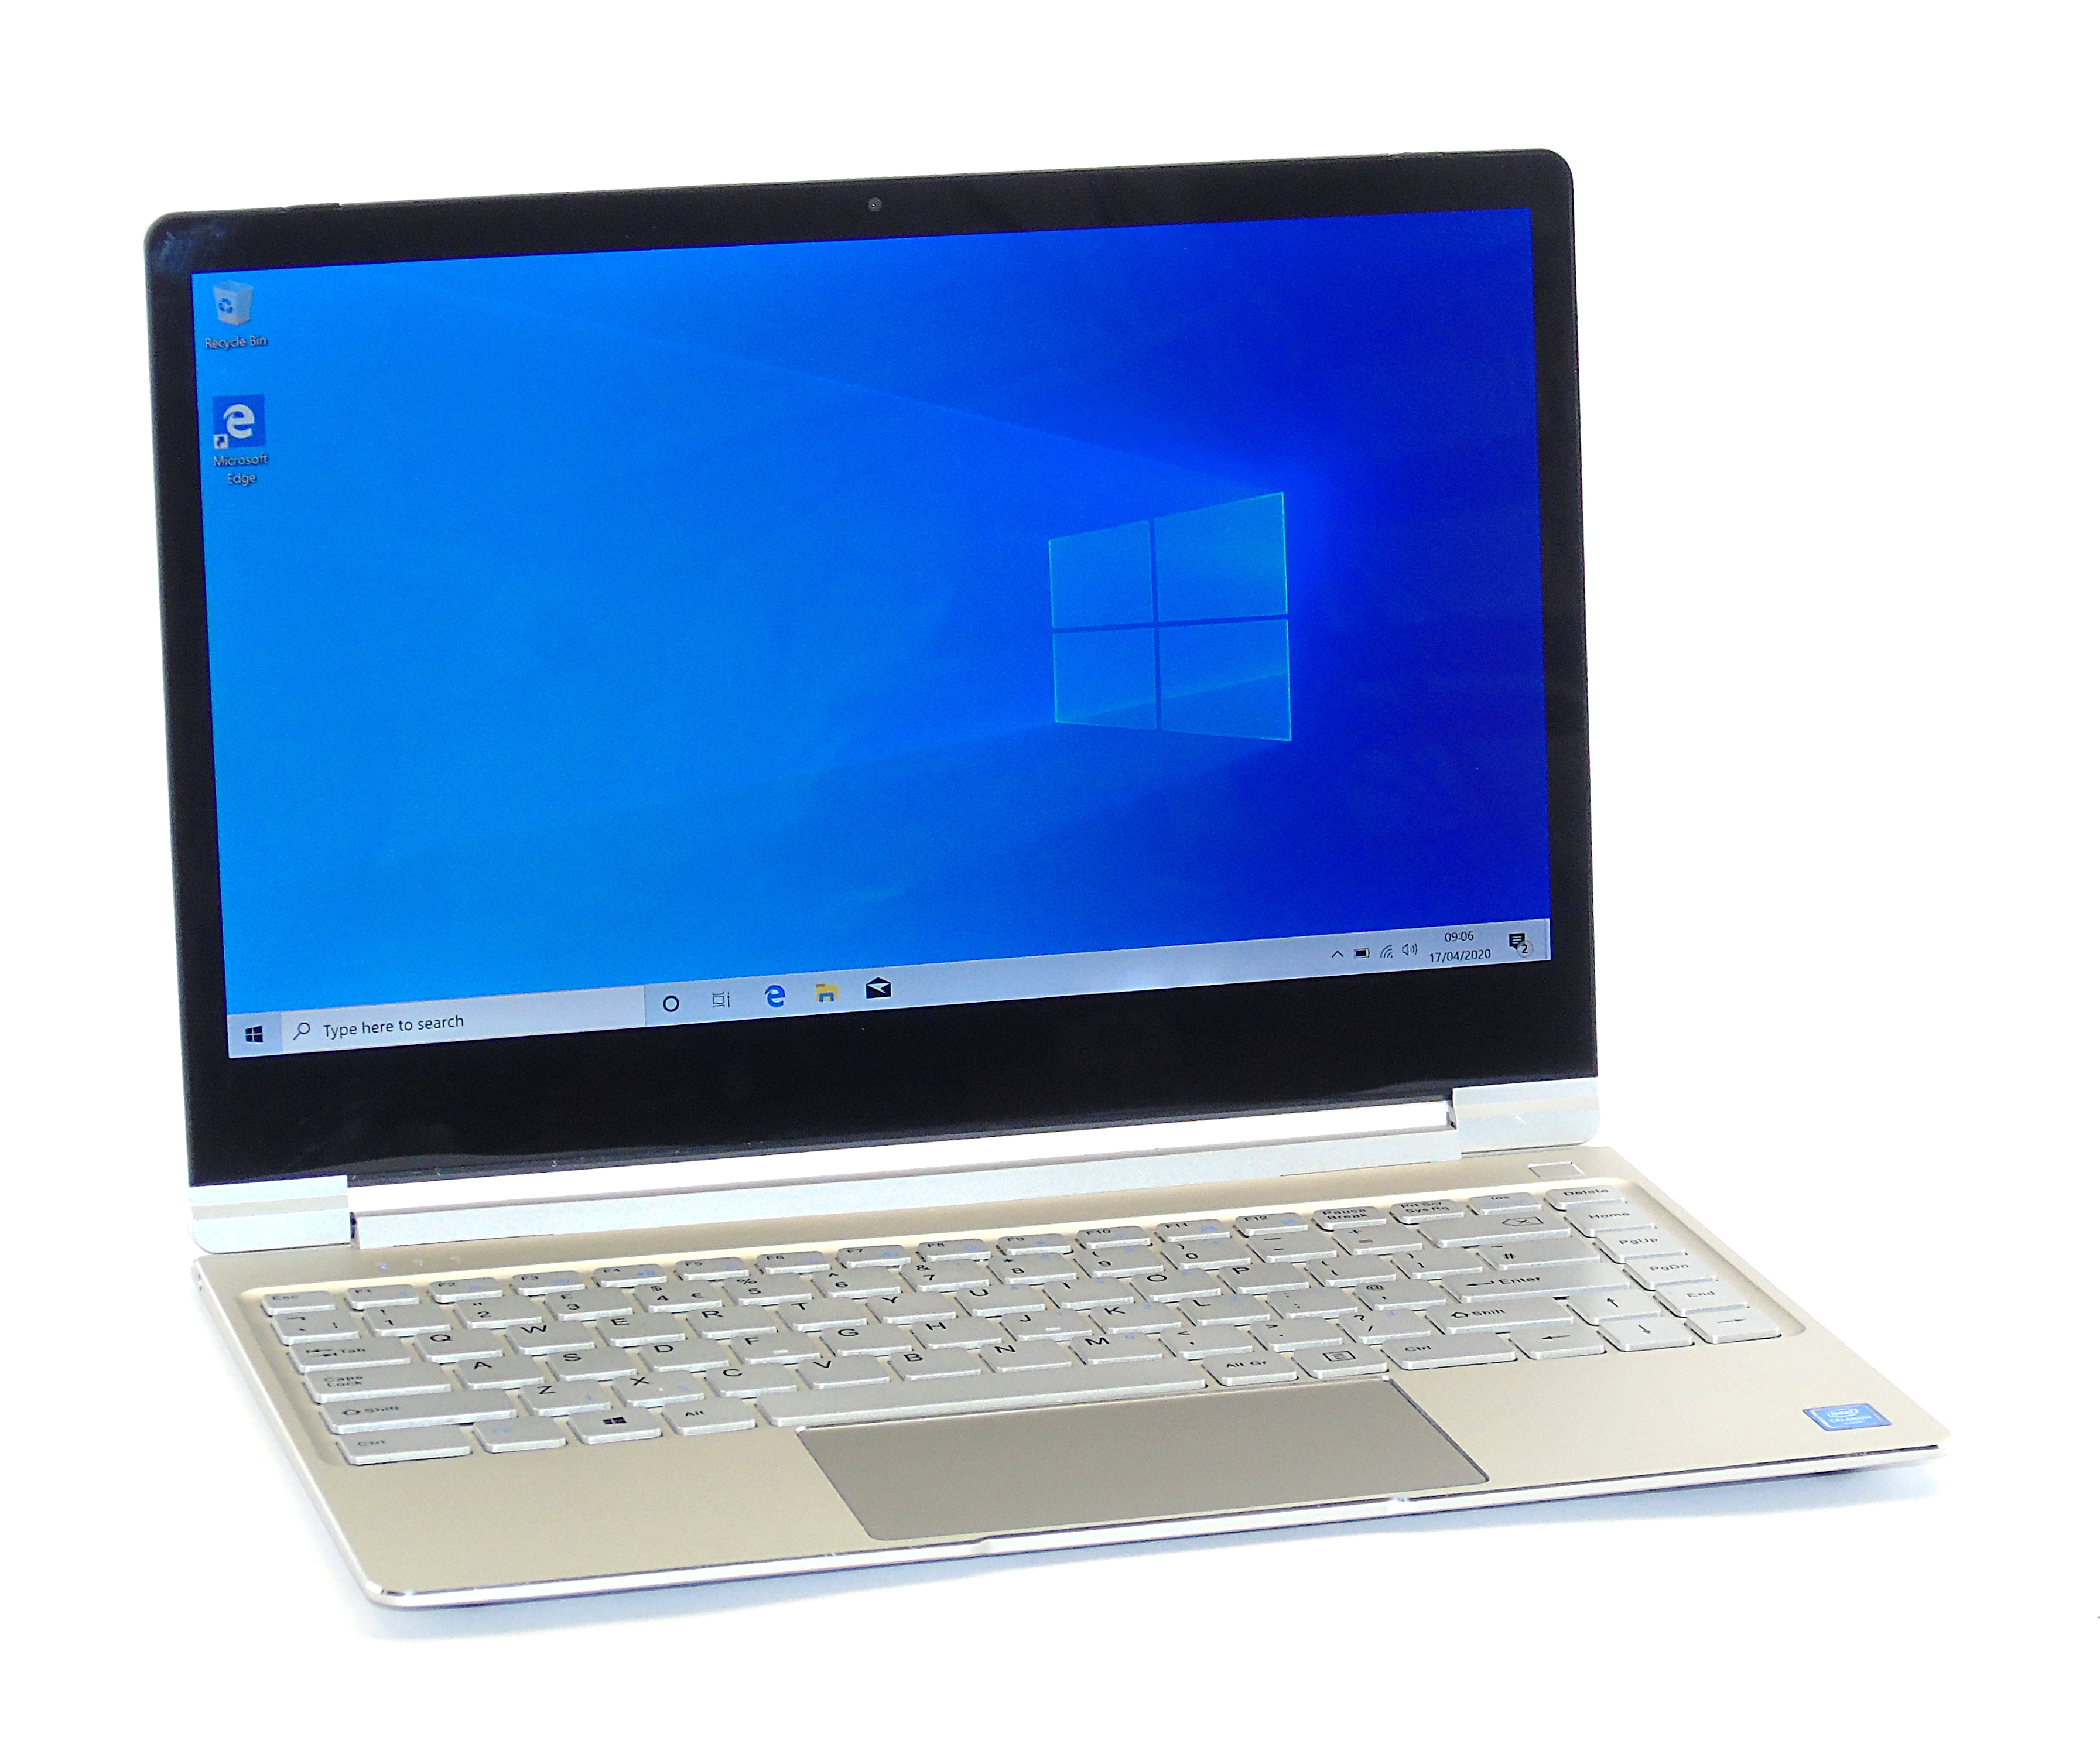 "GeoBook 3X Laptop Pentium 4GB RAM 64GB eMMC 13.3"" Display Windows 10"